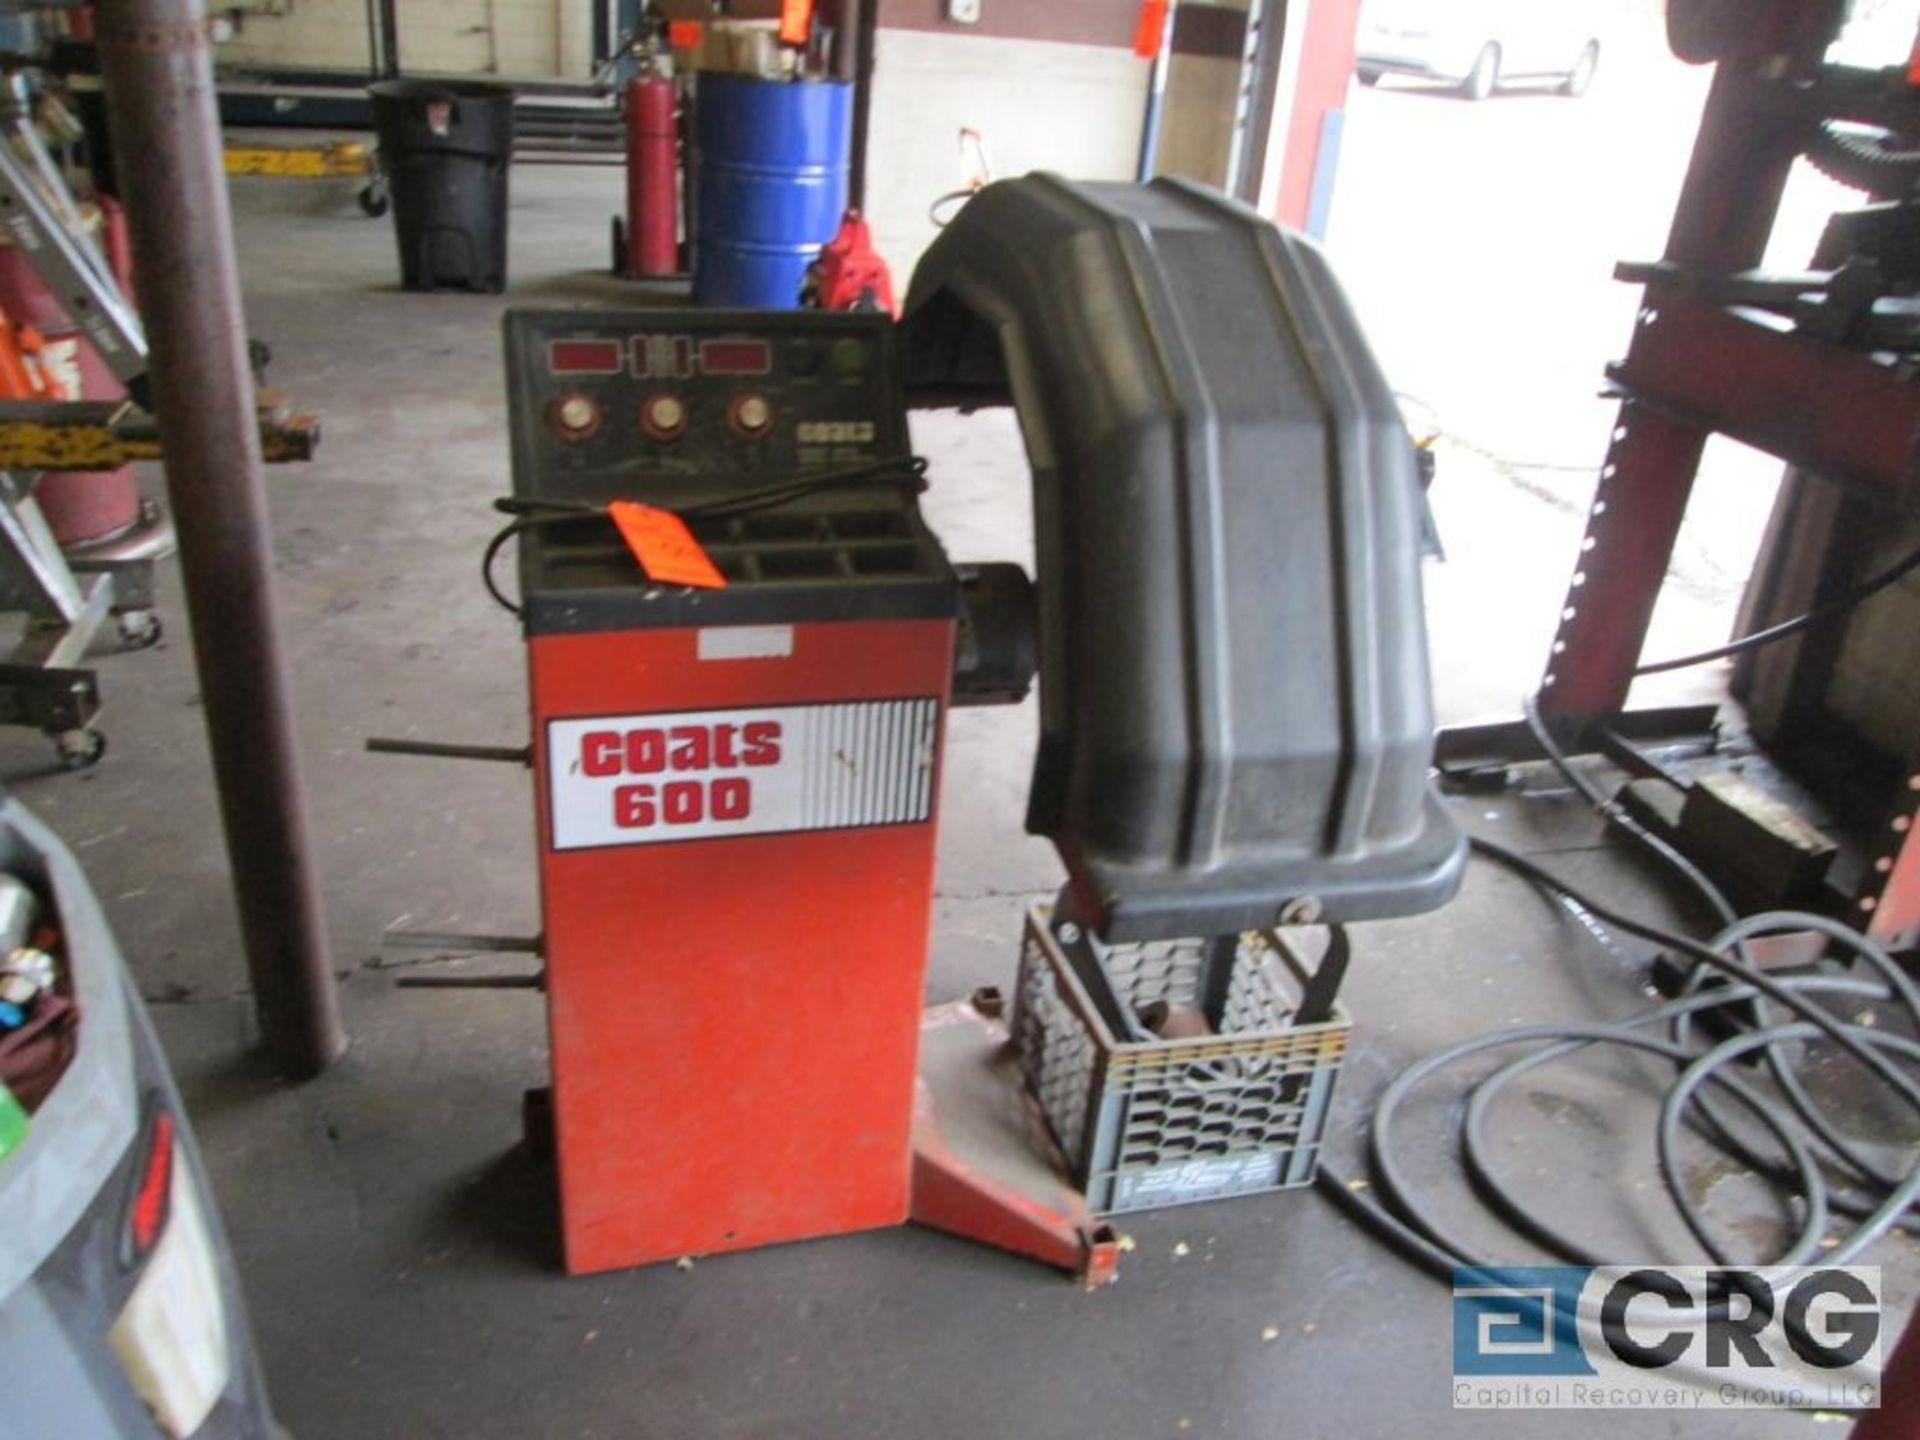 Coats 600 direct drive wheel balancer, 115V, 5 amp, 1 ph, s/n 0892247776 - Image 2 of 6